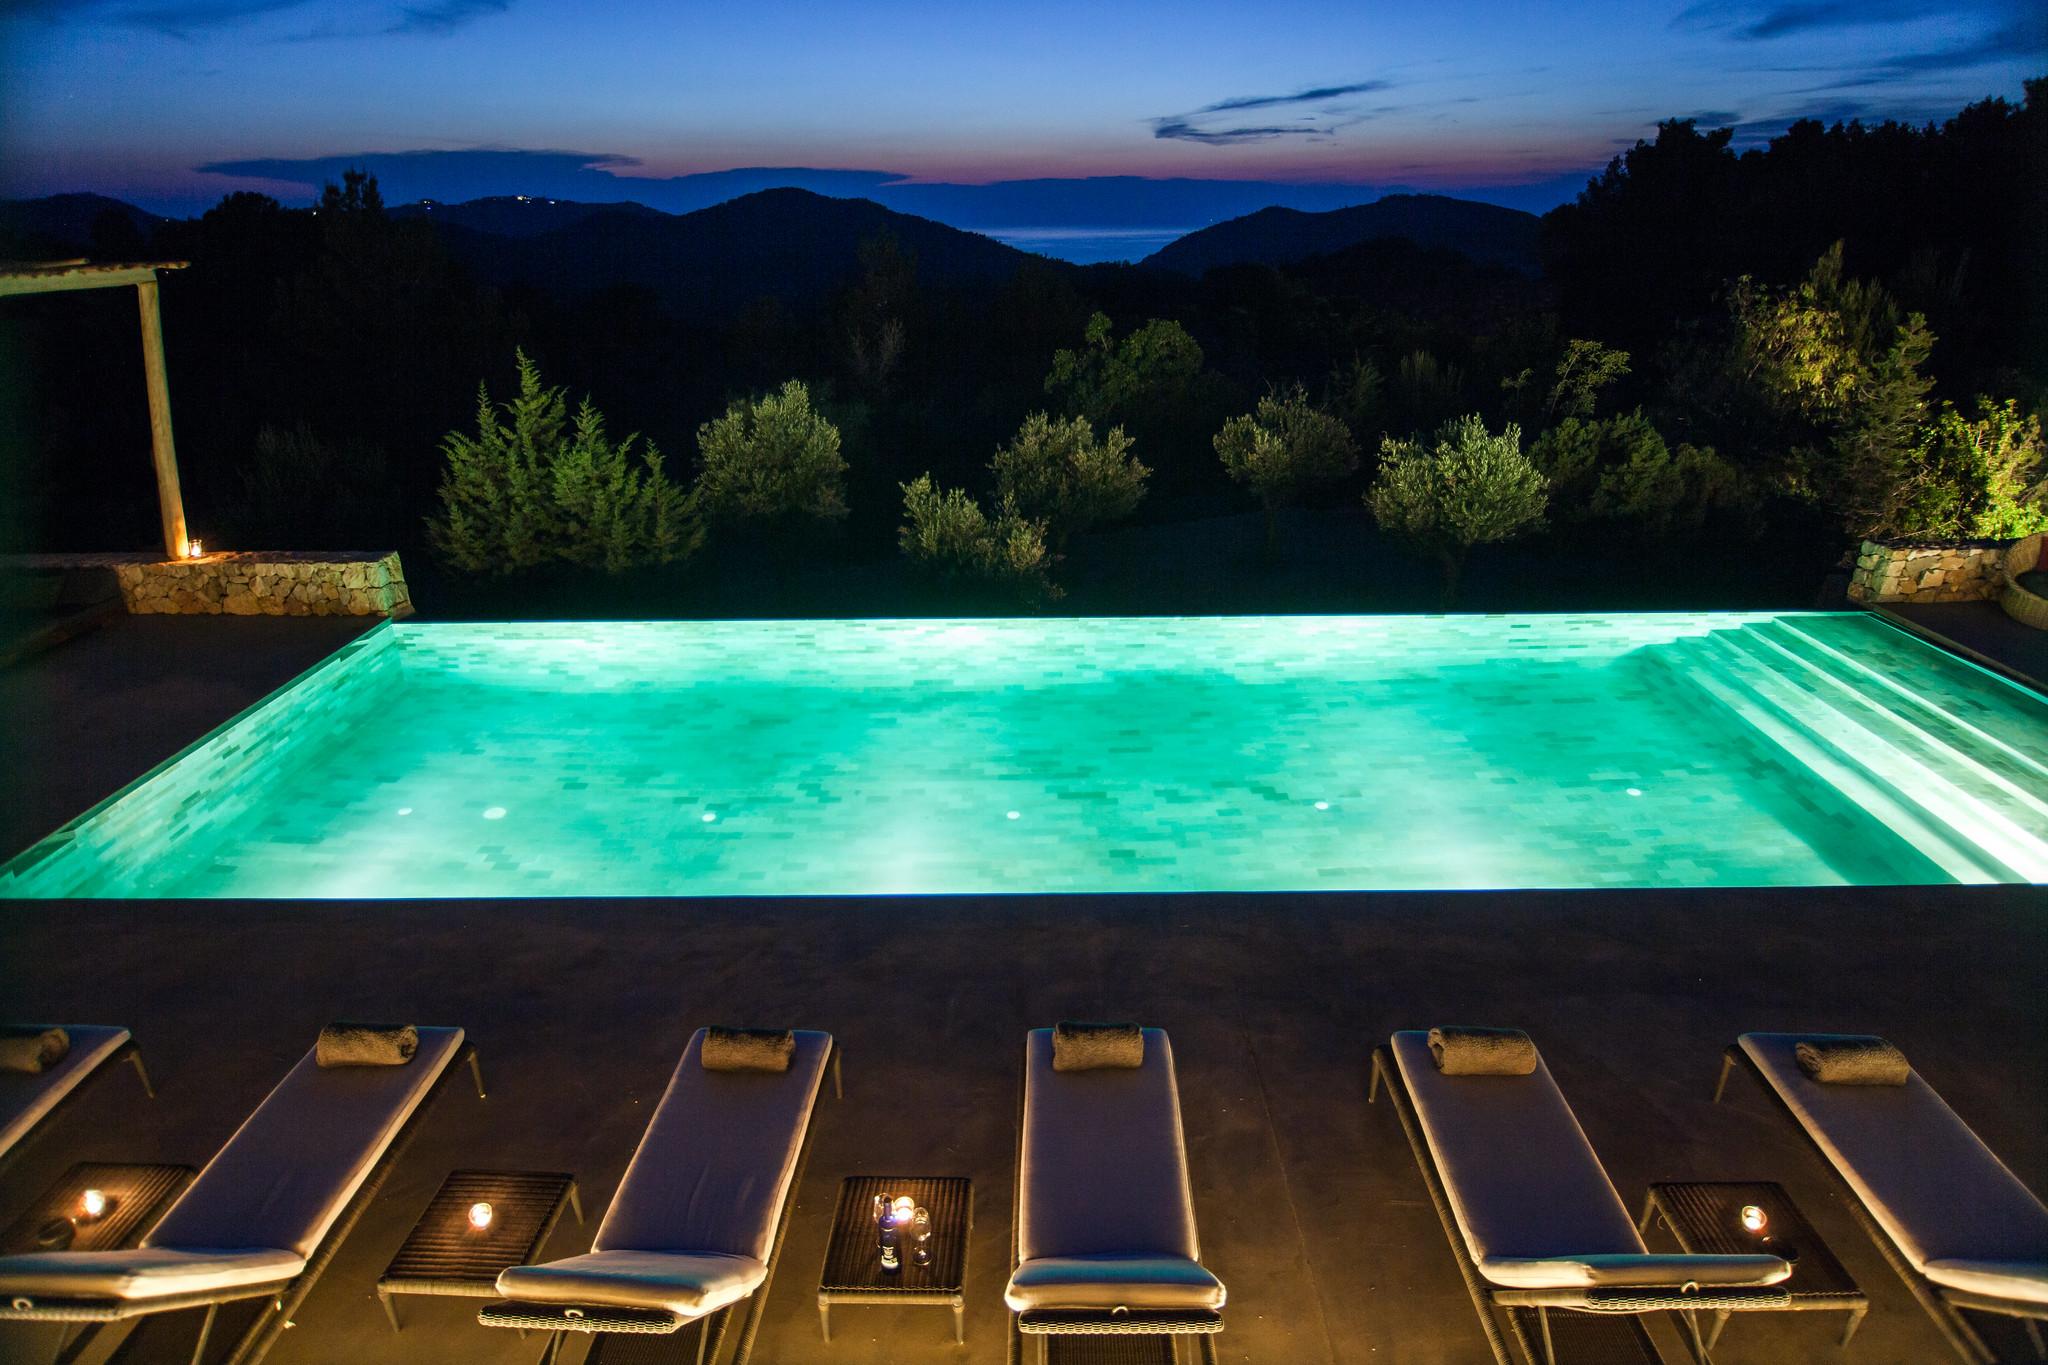 https://www.white-ibiza.com/wp-content/uploads/2020/05/white-ibiza-villas-can-zama-pool-at-night-view.jpg